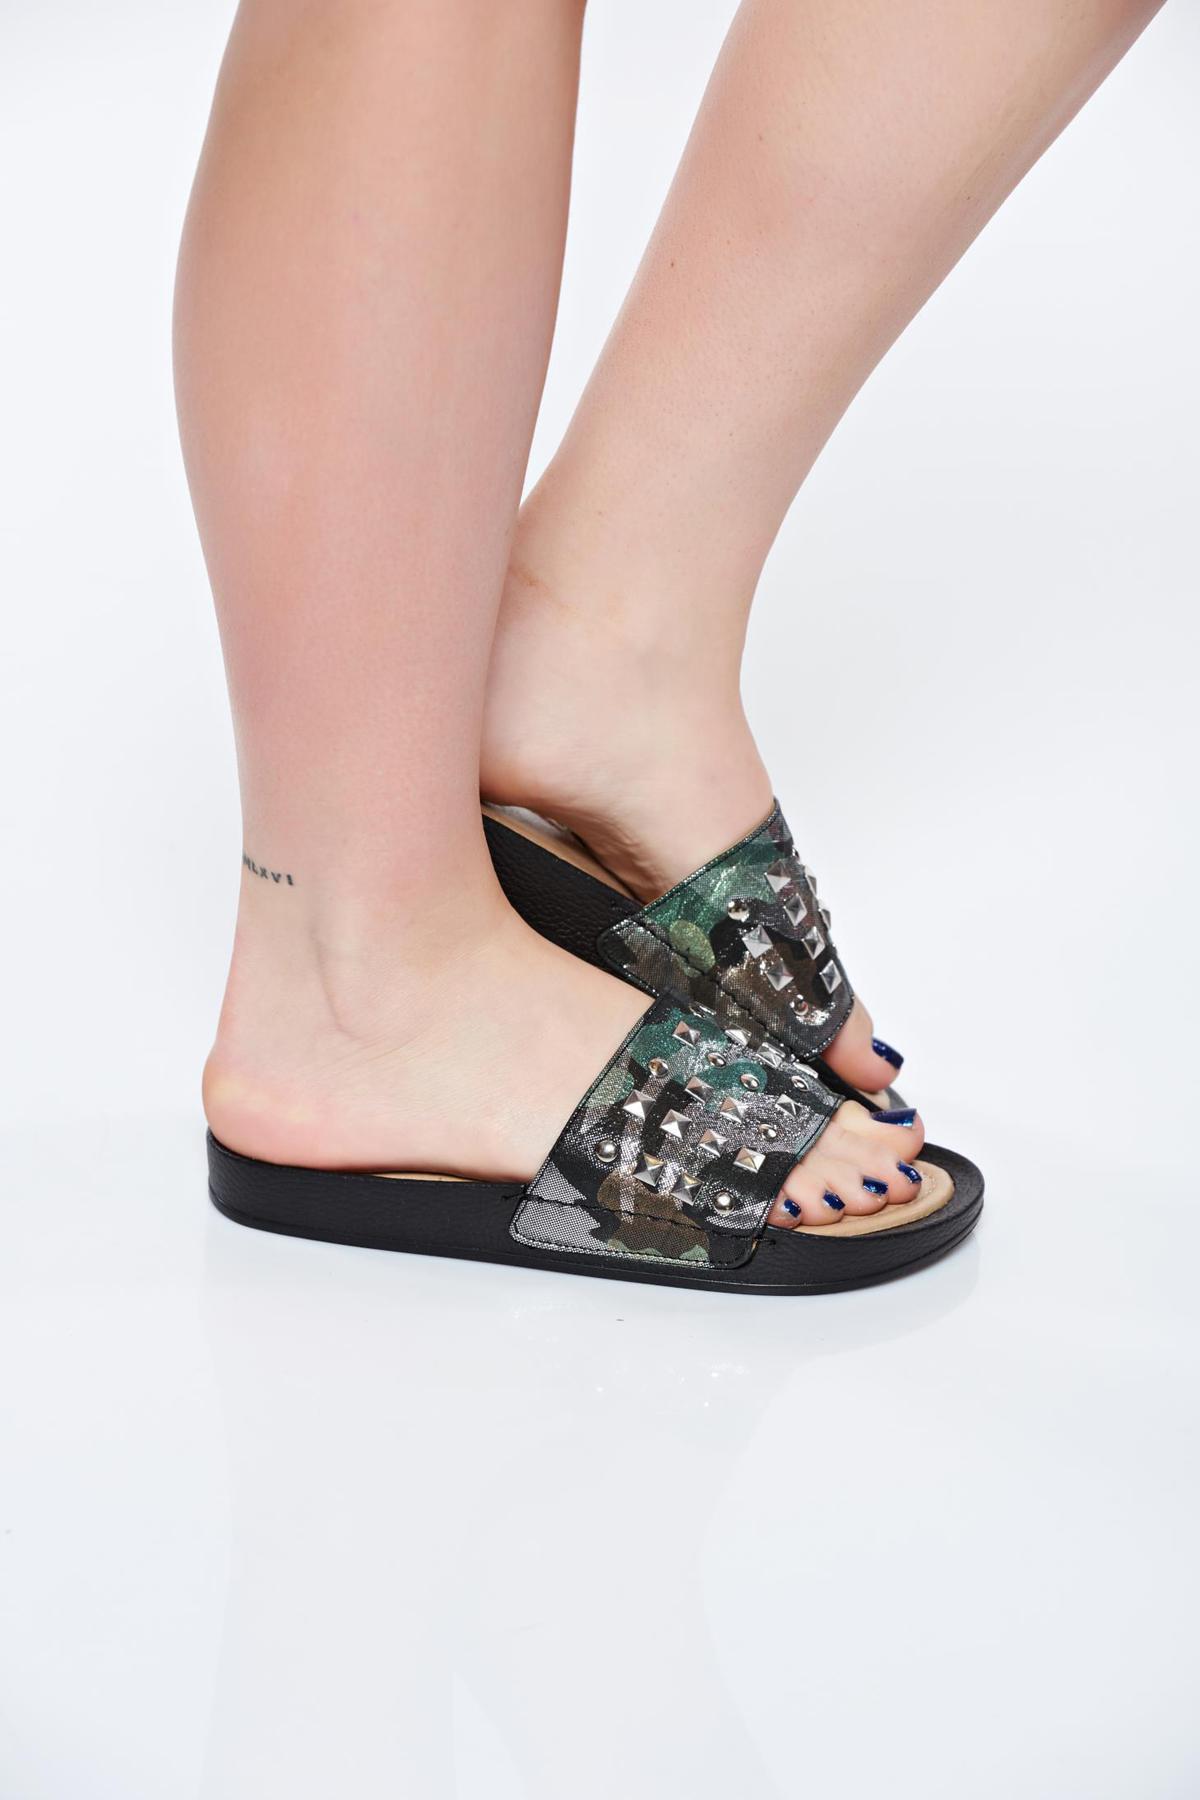 Papuci Missq Negri Casual Din Piele Naturala Cu Talpa Usoara